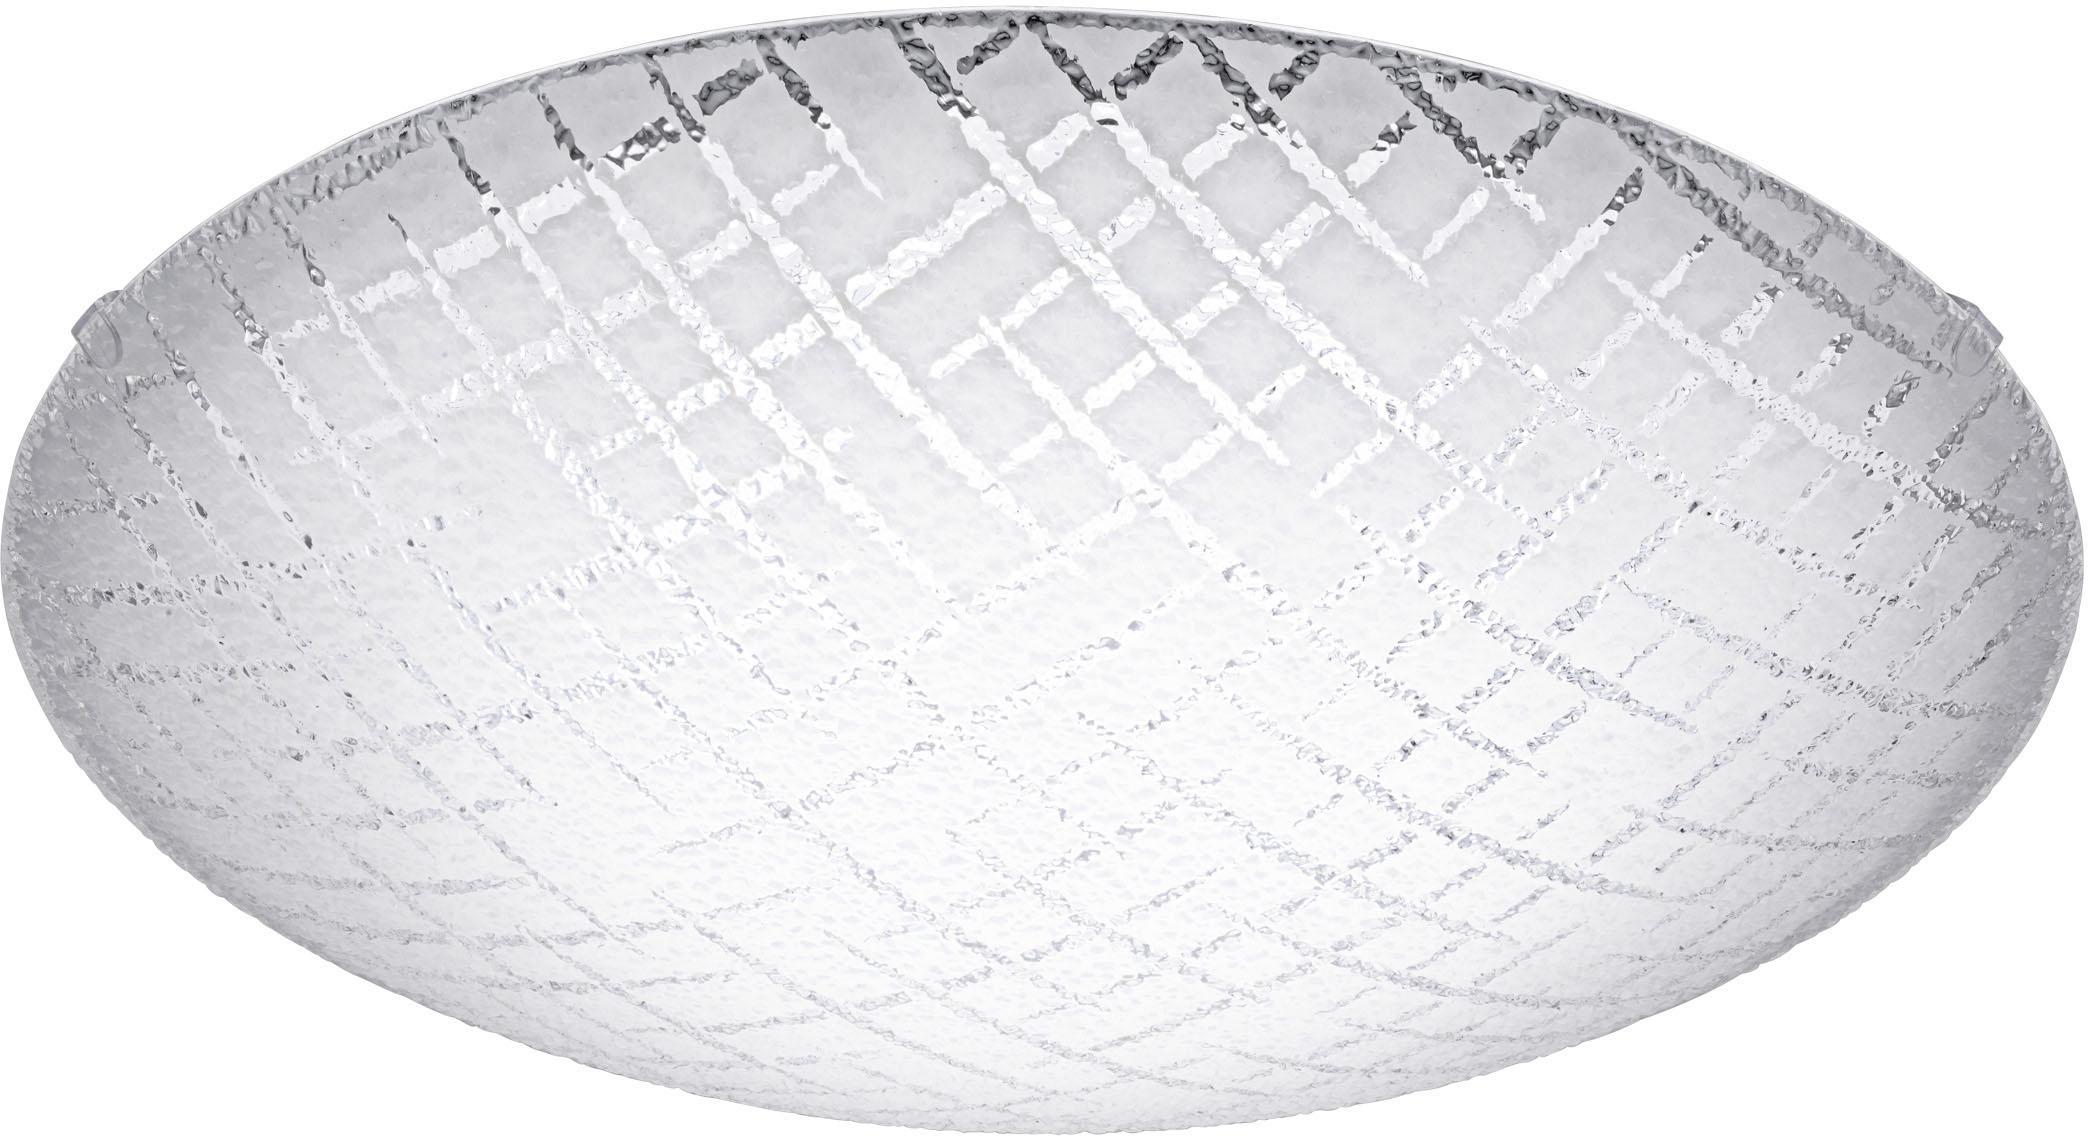 EGLO Deckenleuchte RICONTO 1, LED-Board, Warmweiß, LED tauschbar